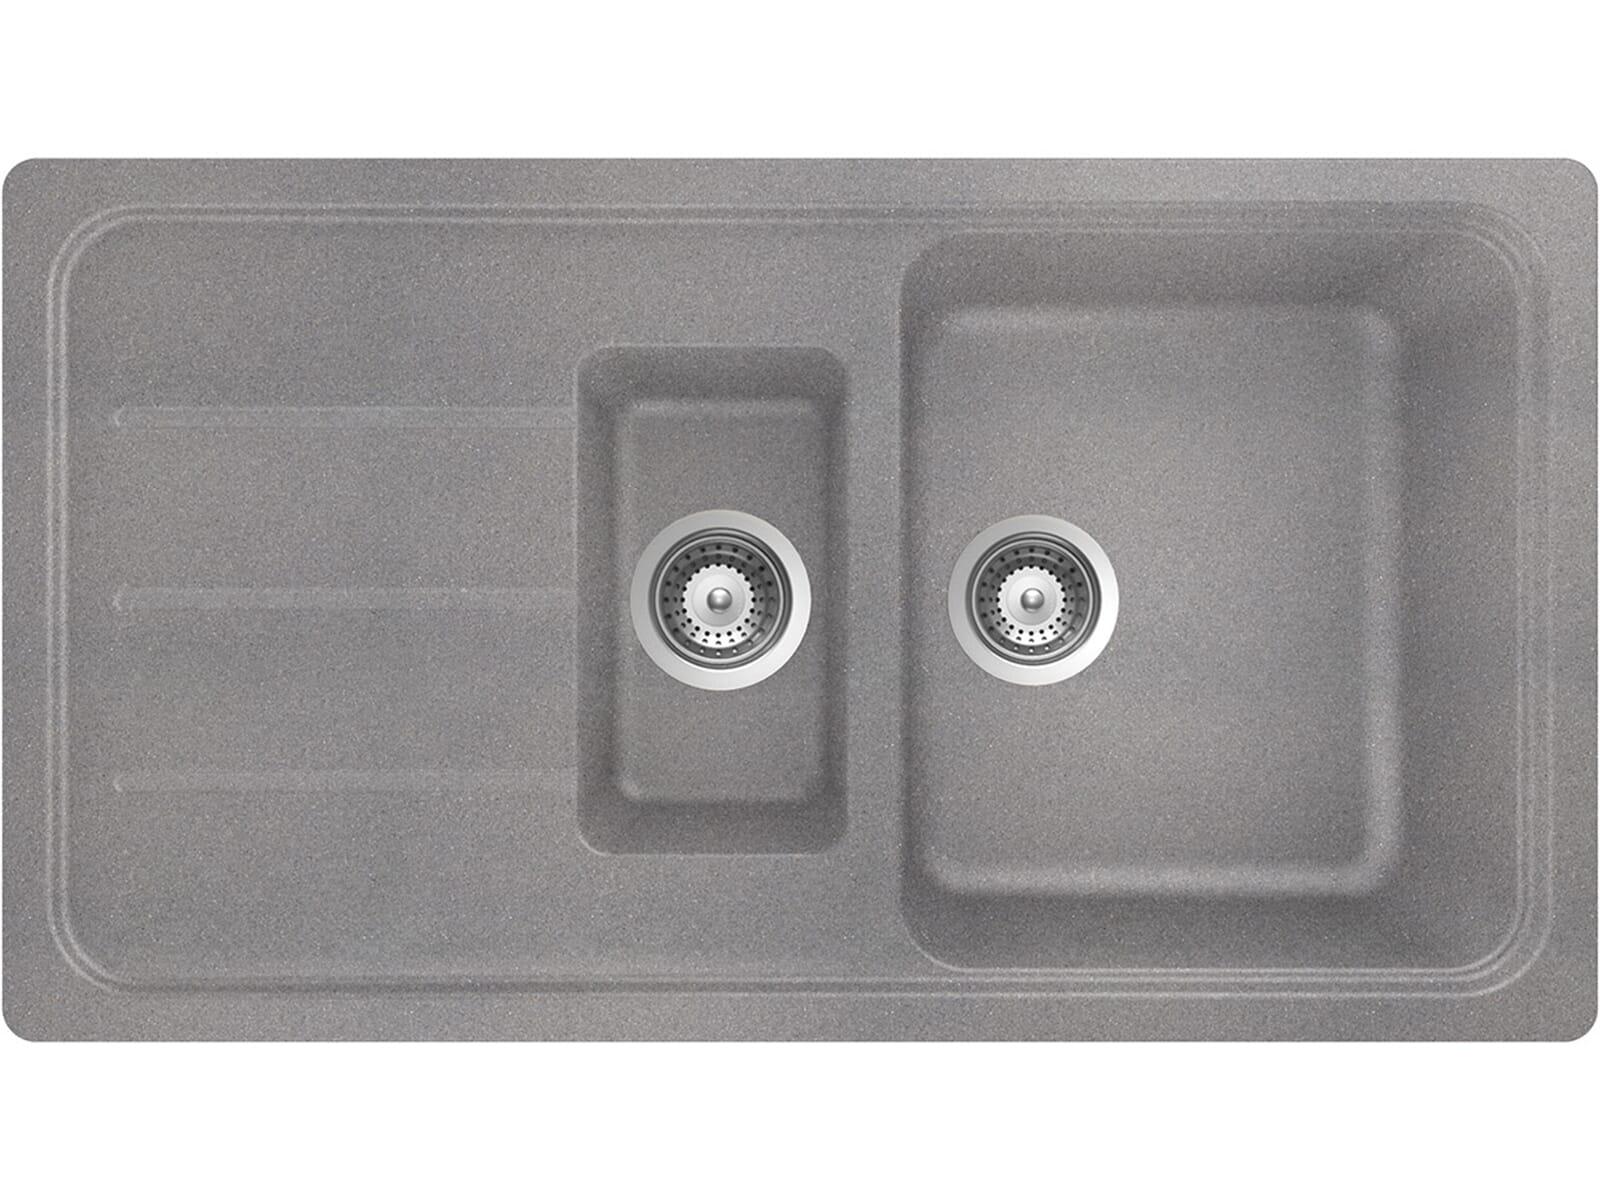 Schock Formhaus D-150 Croma Granit-Spüle Grau Küchenspüle Einbau ...